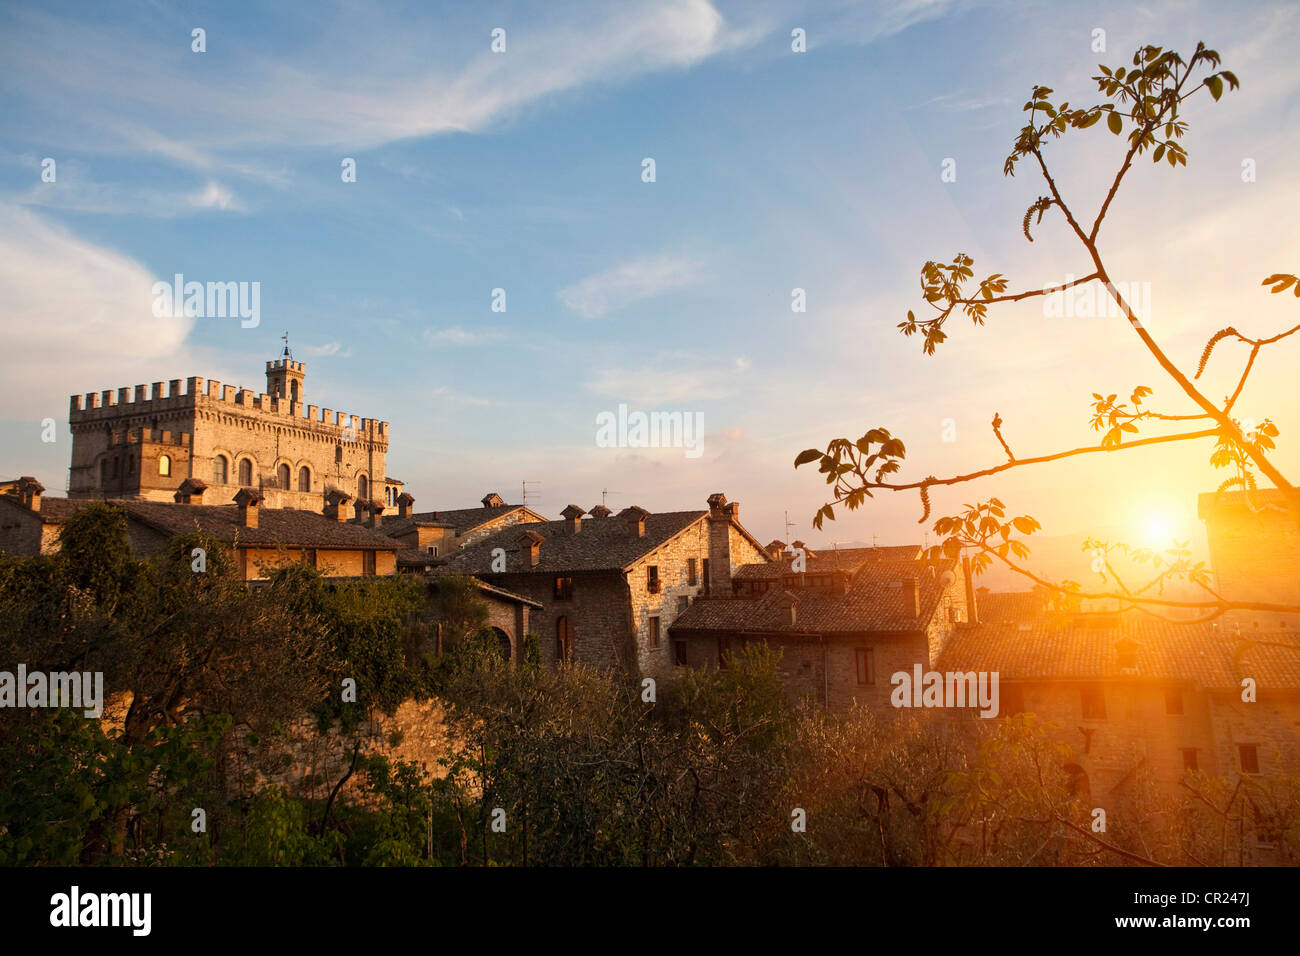 Sun shining on village houses - Stock Image